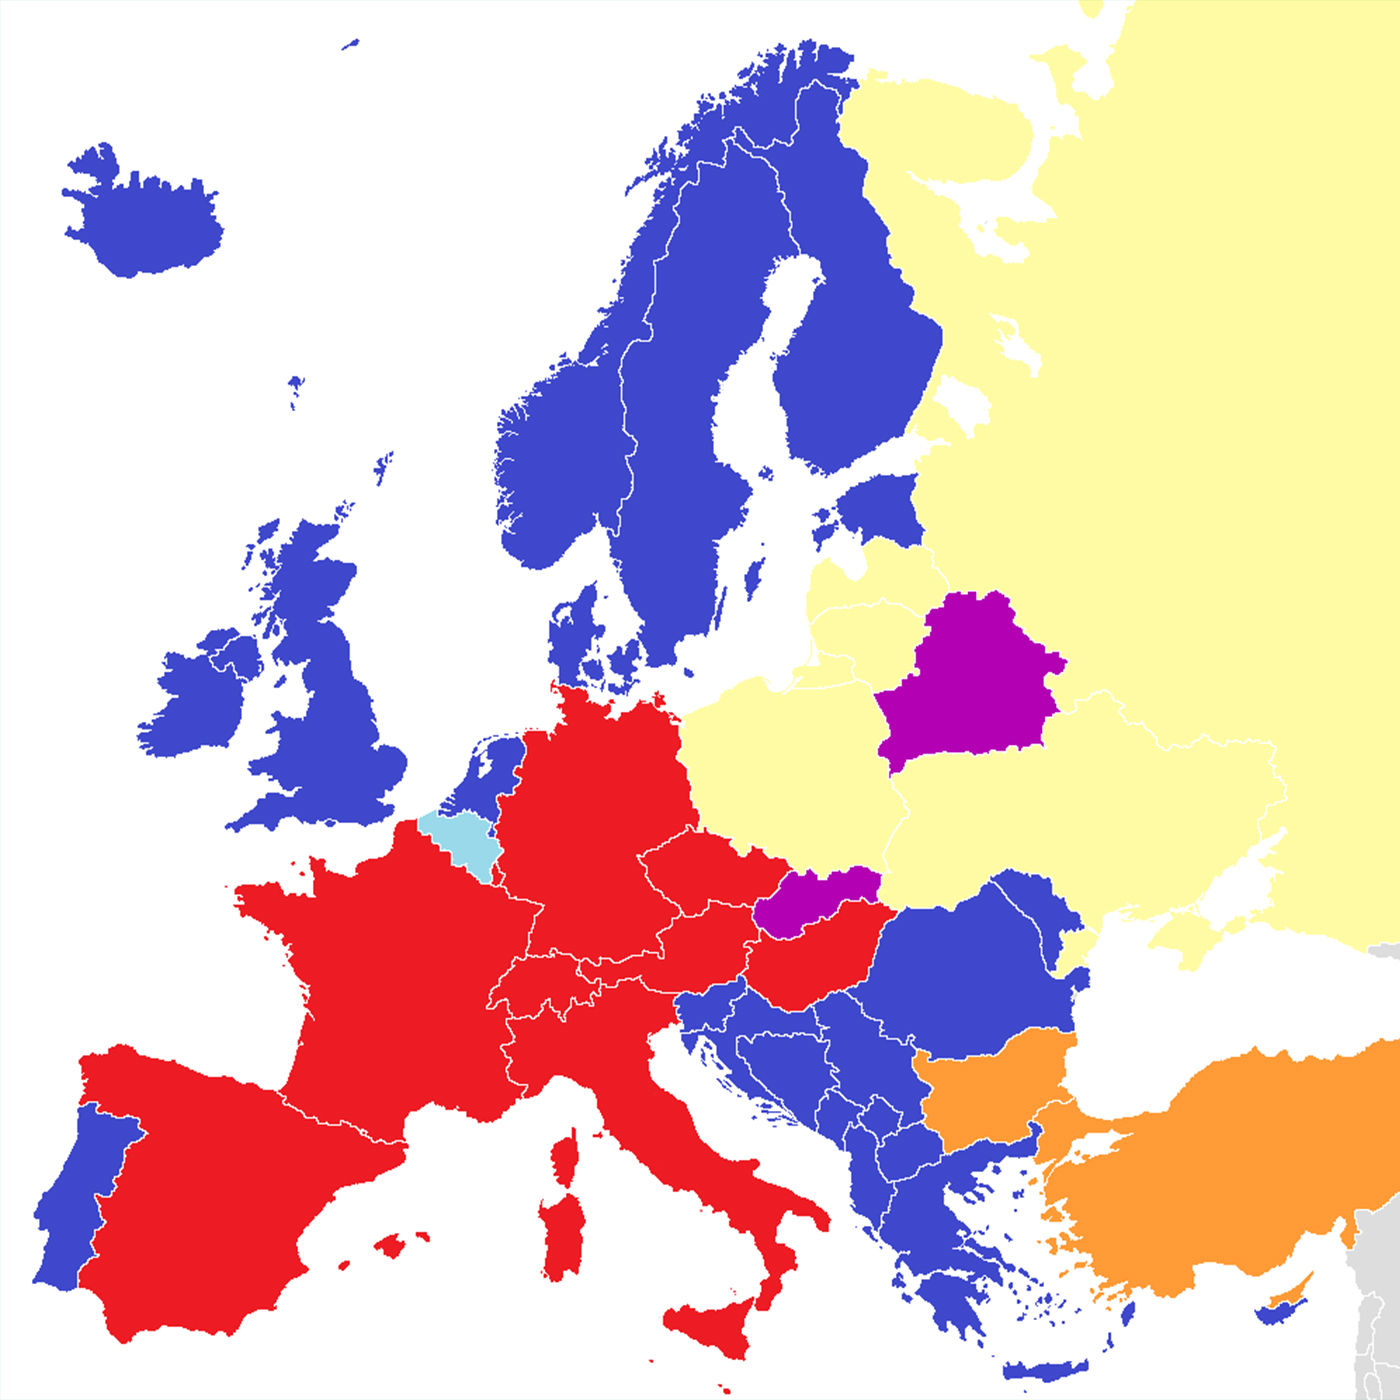 European Dubbing Practices